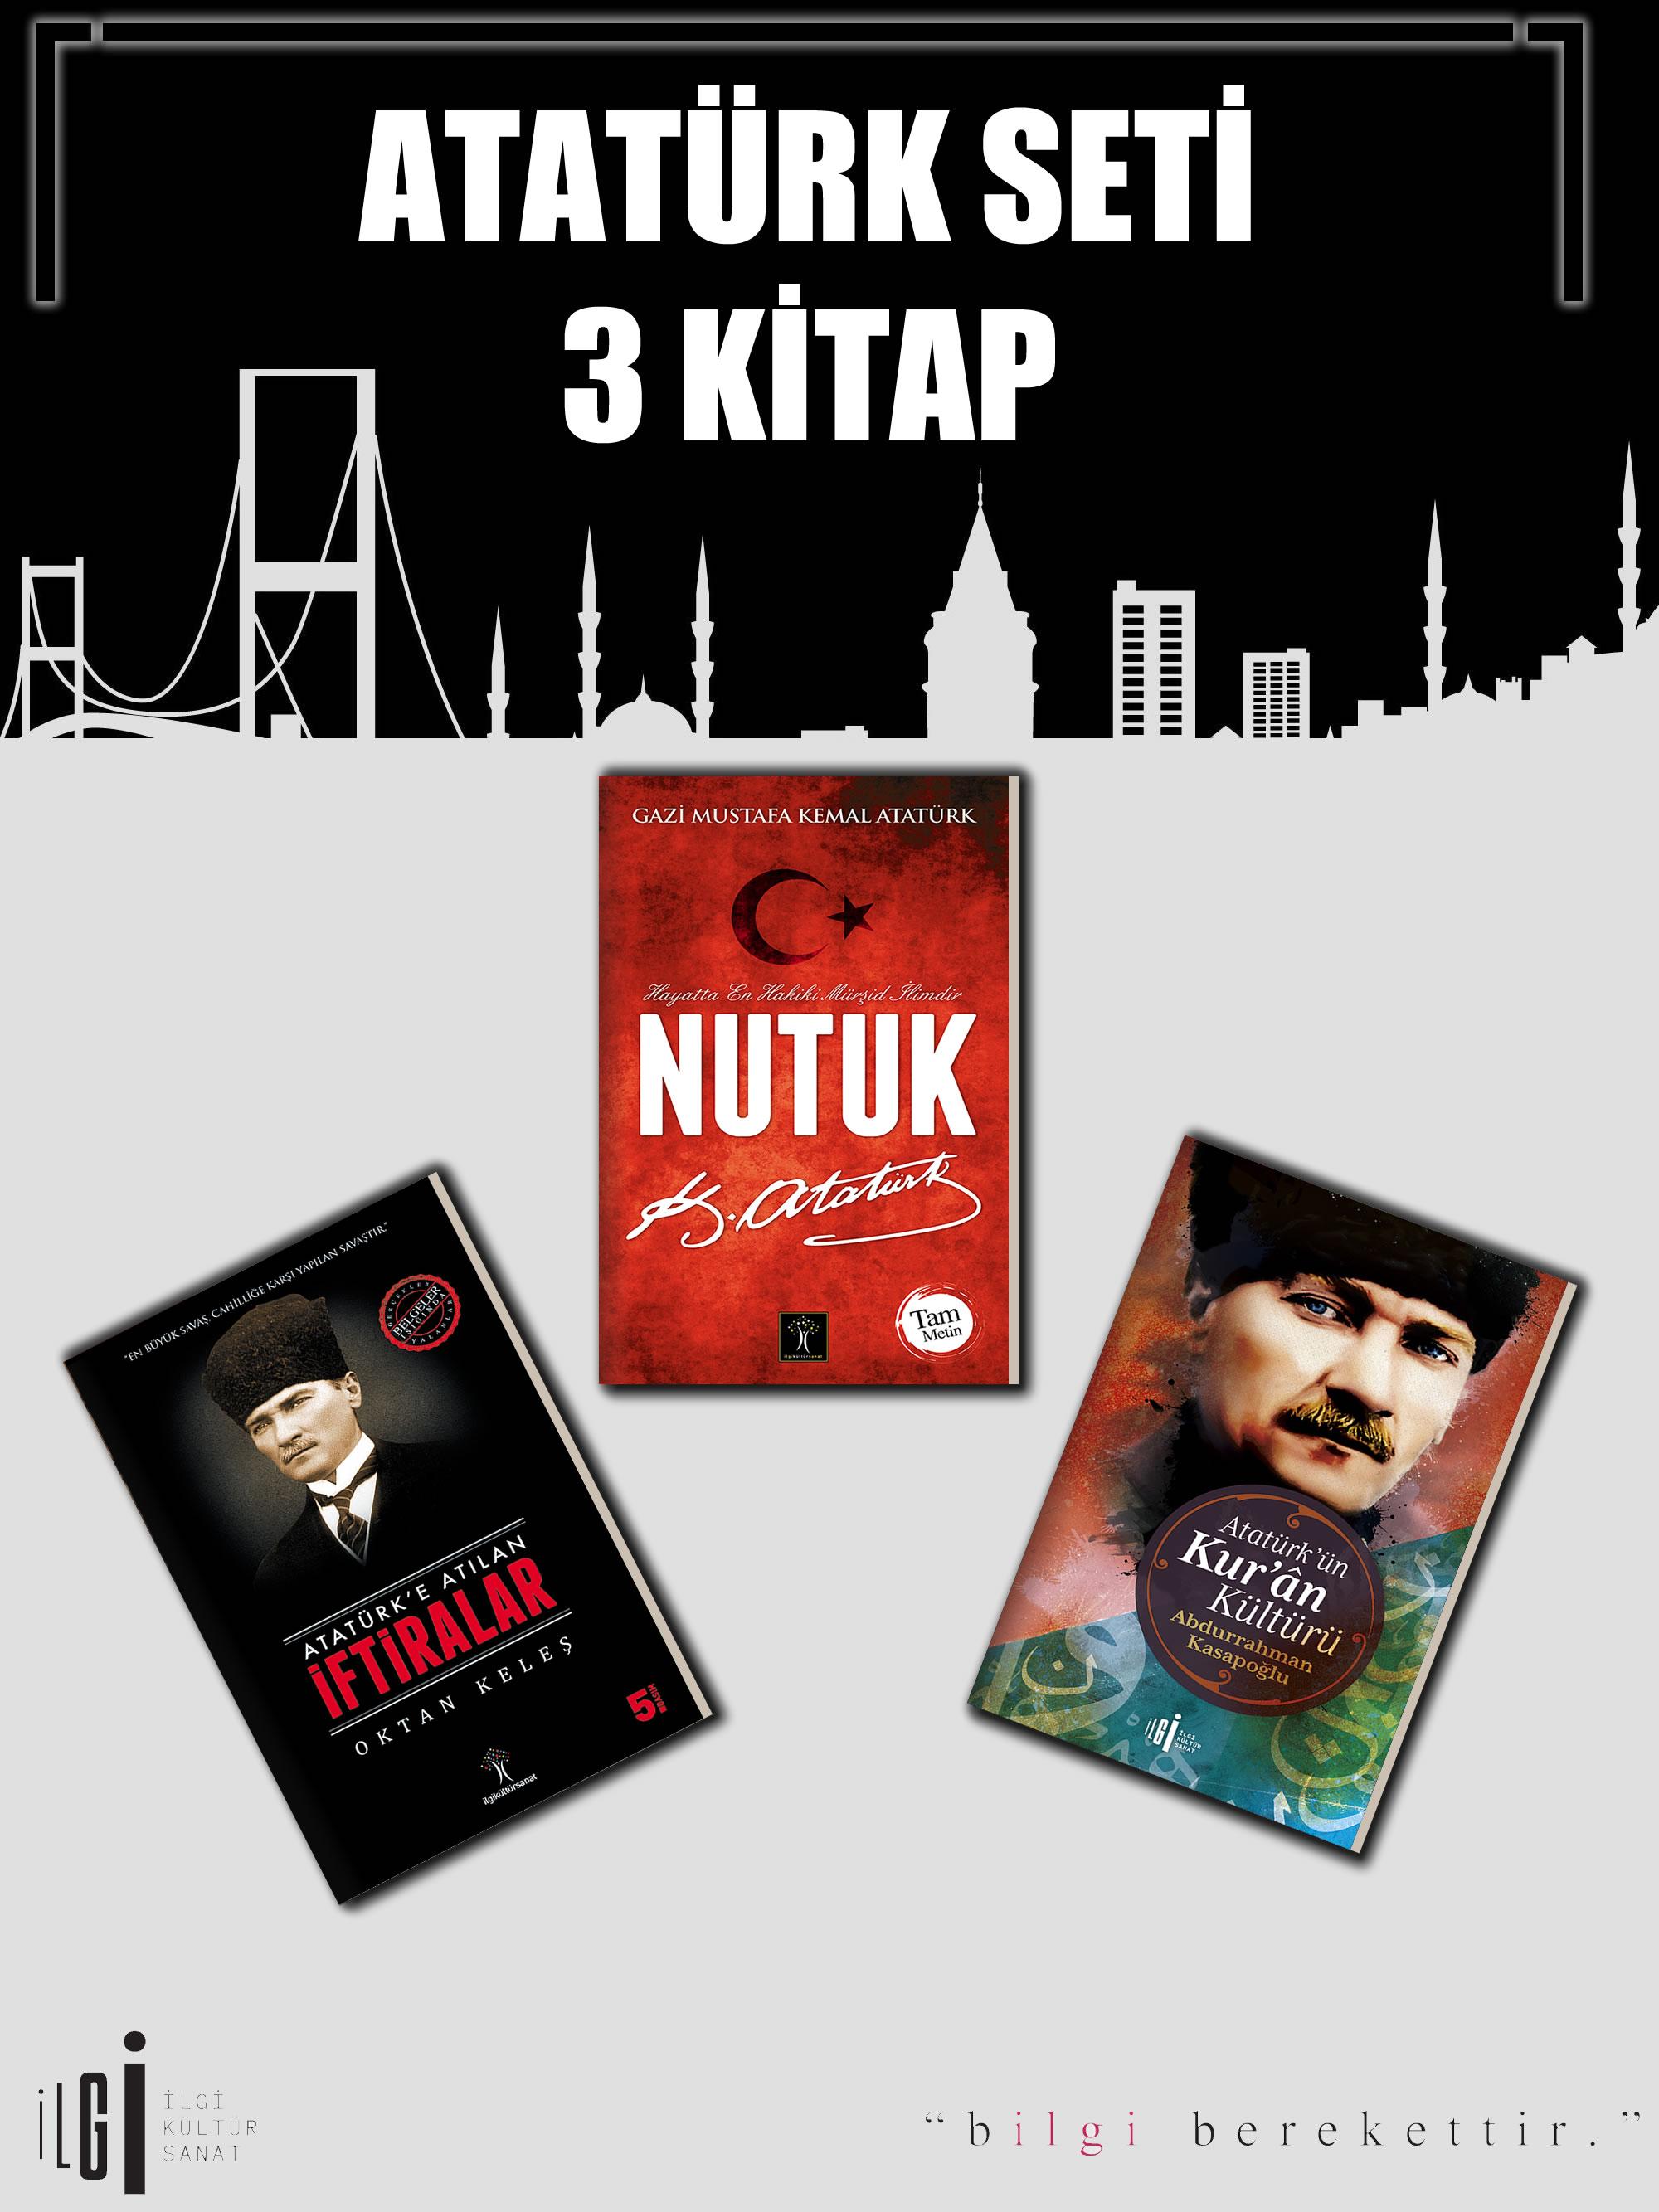 Atatürk Seti 3 Kitap